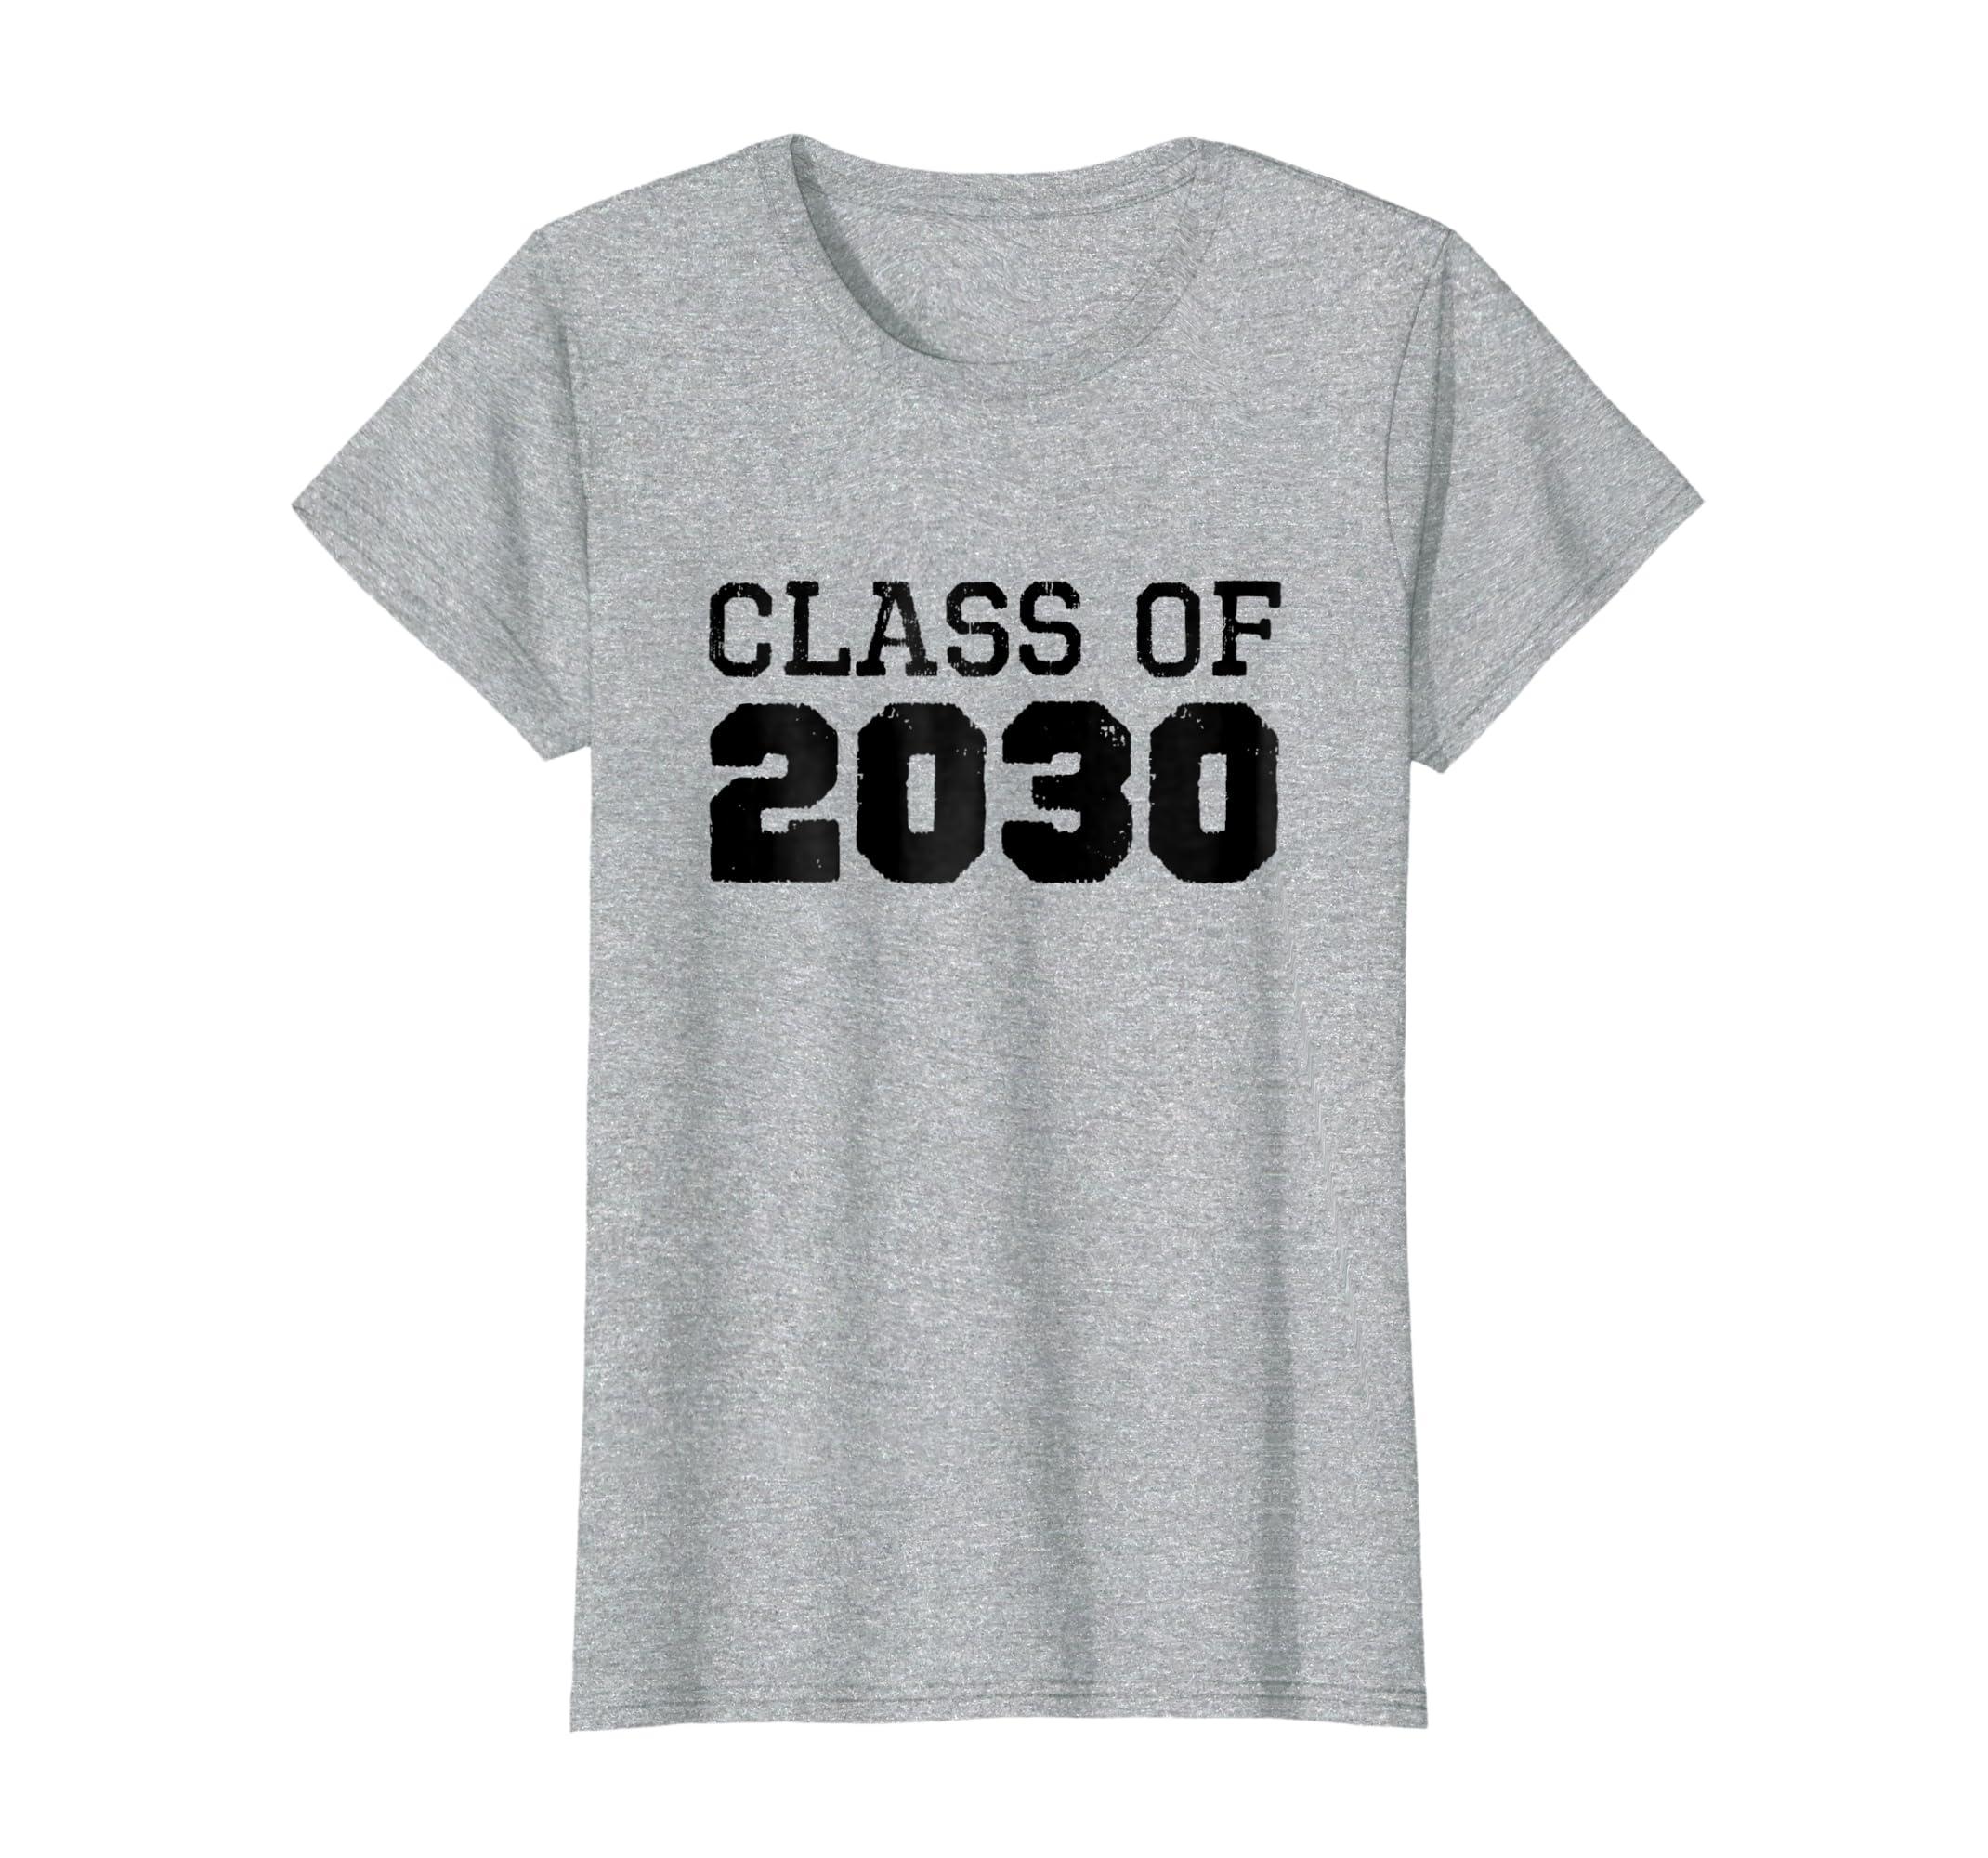 Class Of 2030 Future Graduates Vintage T Shirt